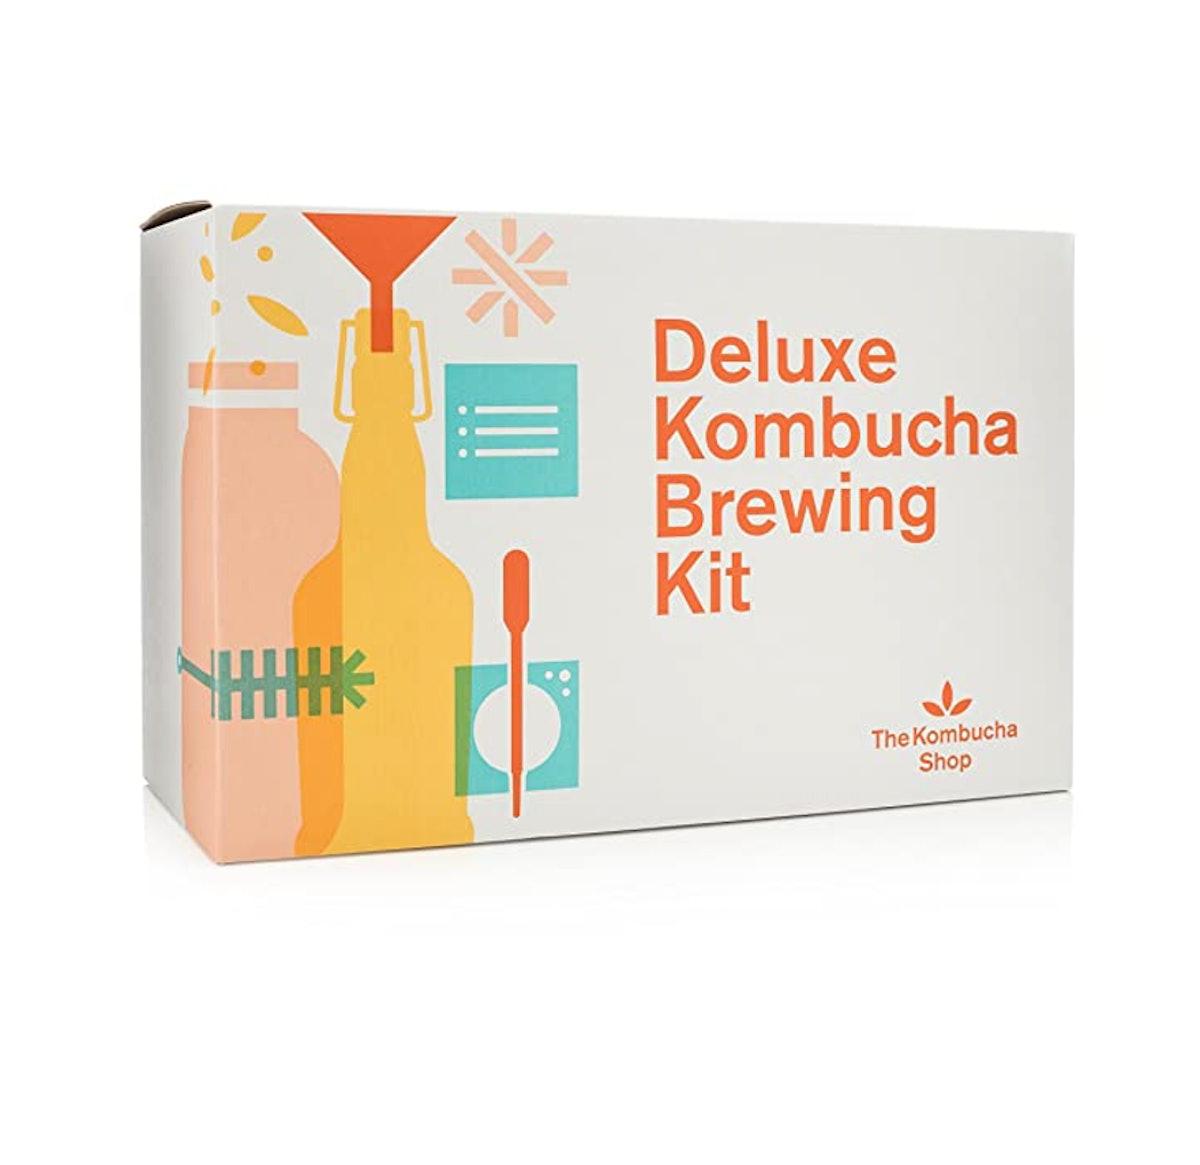 The Kombucha Deluxe Kombucha Brewing Kit